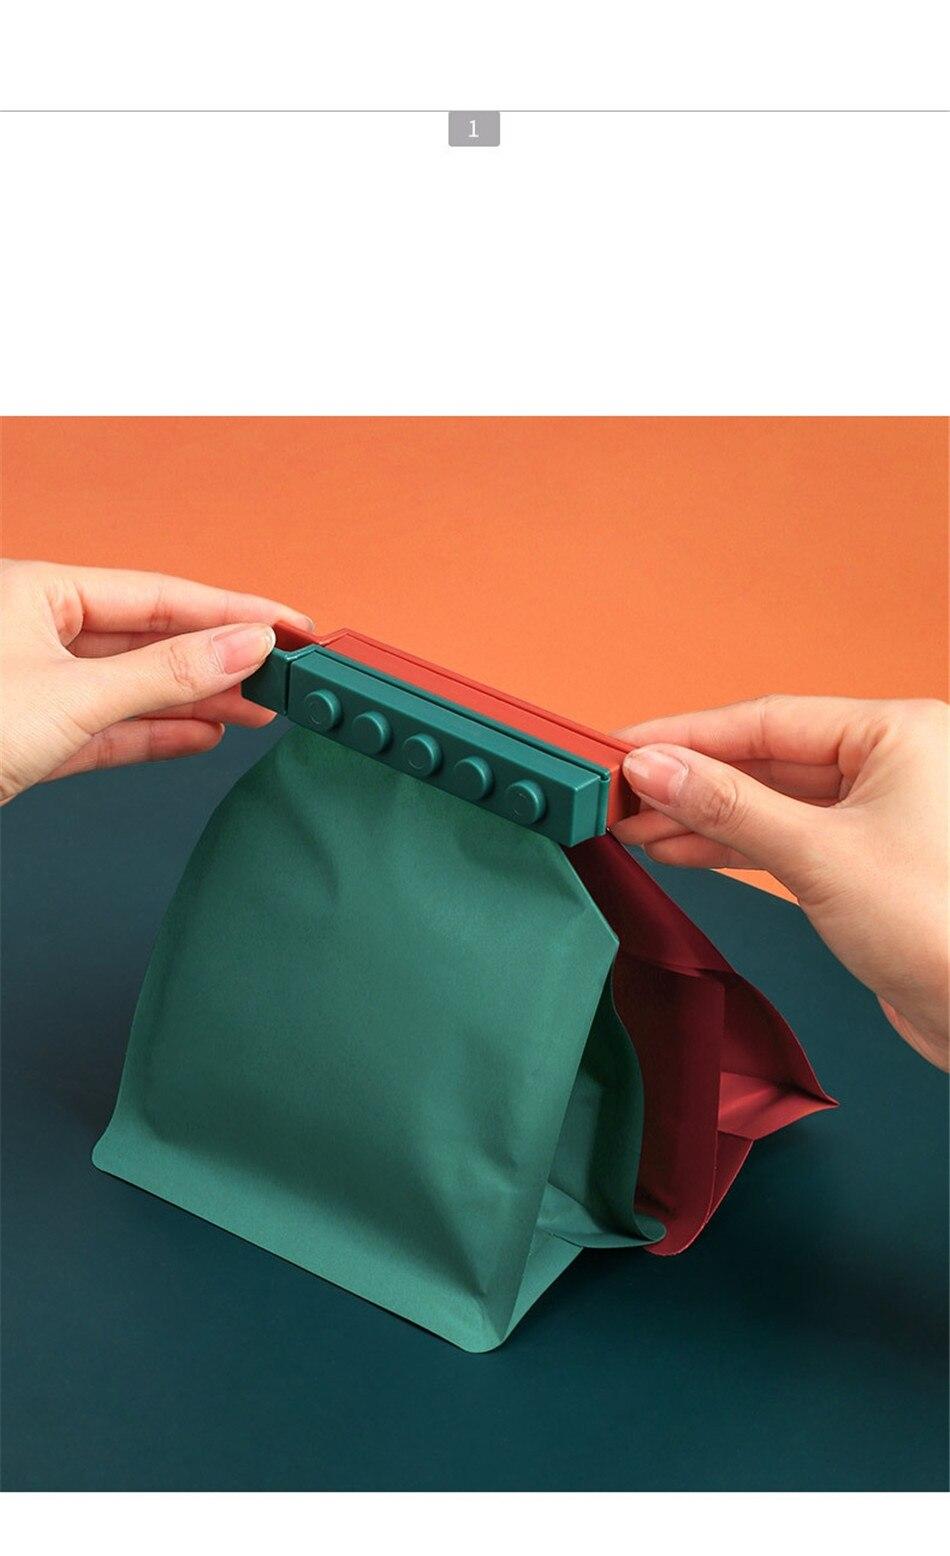 Creative Food Sealing Clip Kitchen Building Block Fresh-keeping Clip Snack Plastic Bag Moisture-proof Sealing 4 pcs Clips